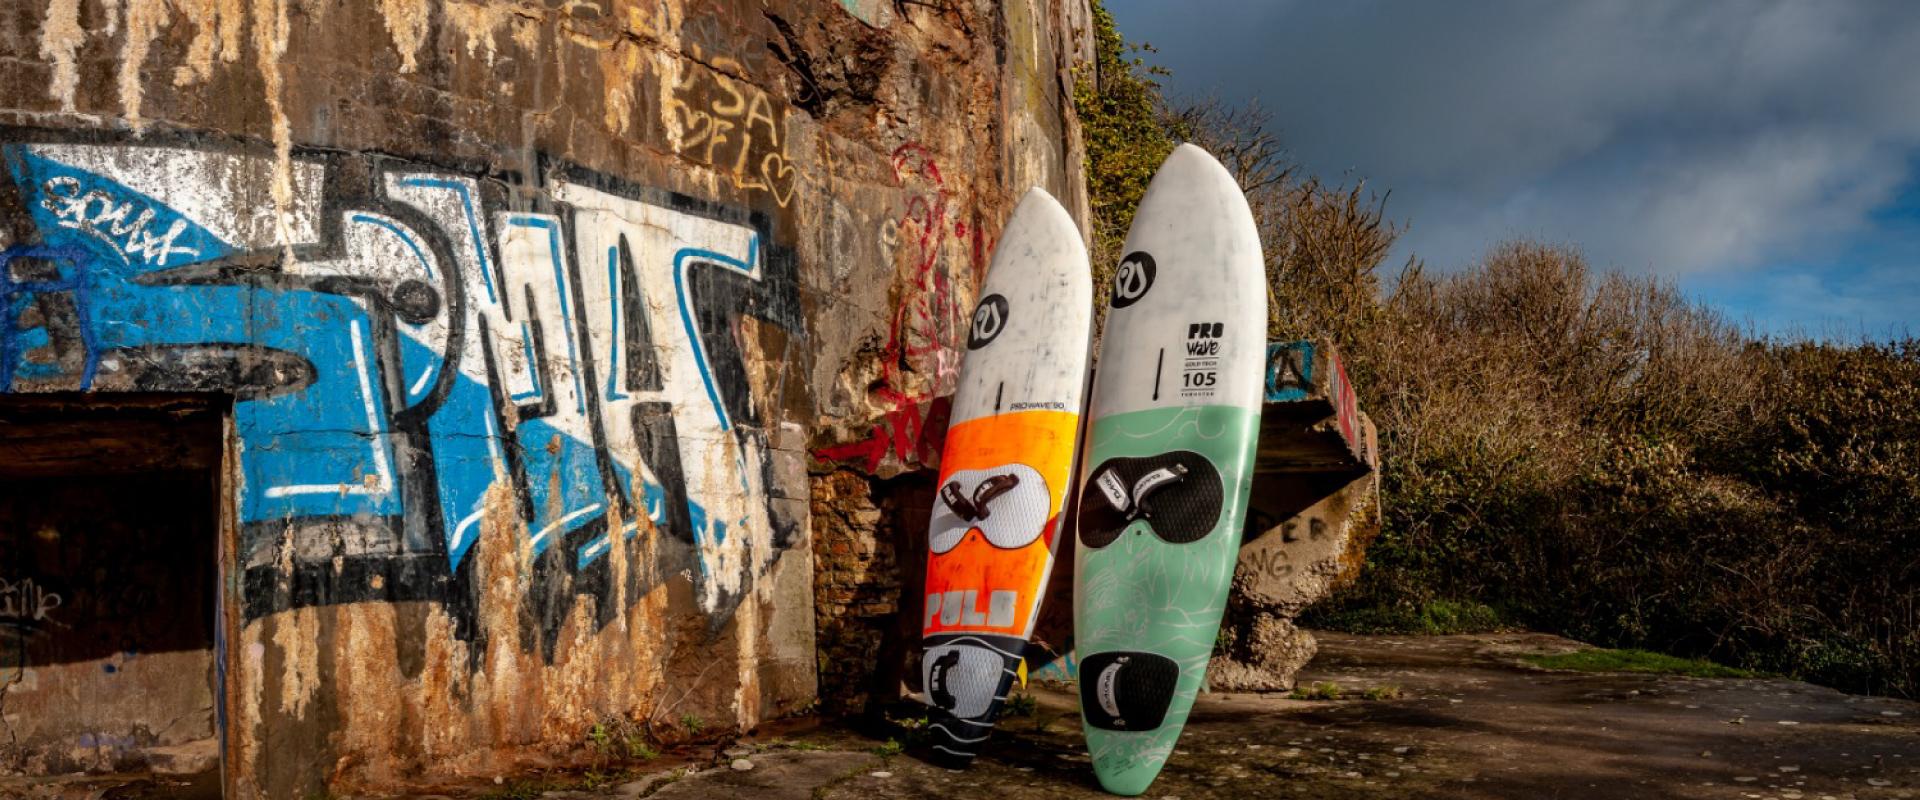 PULS Boards boards range